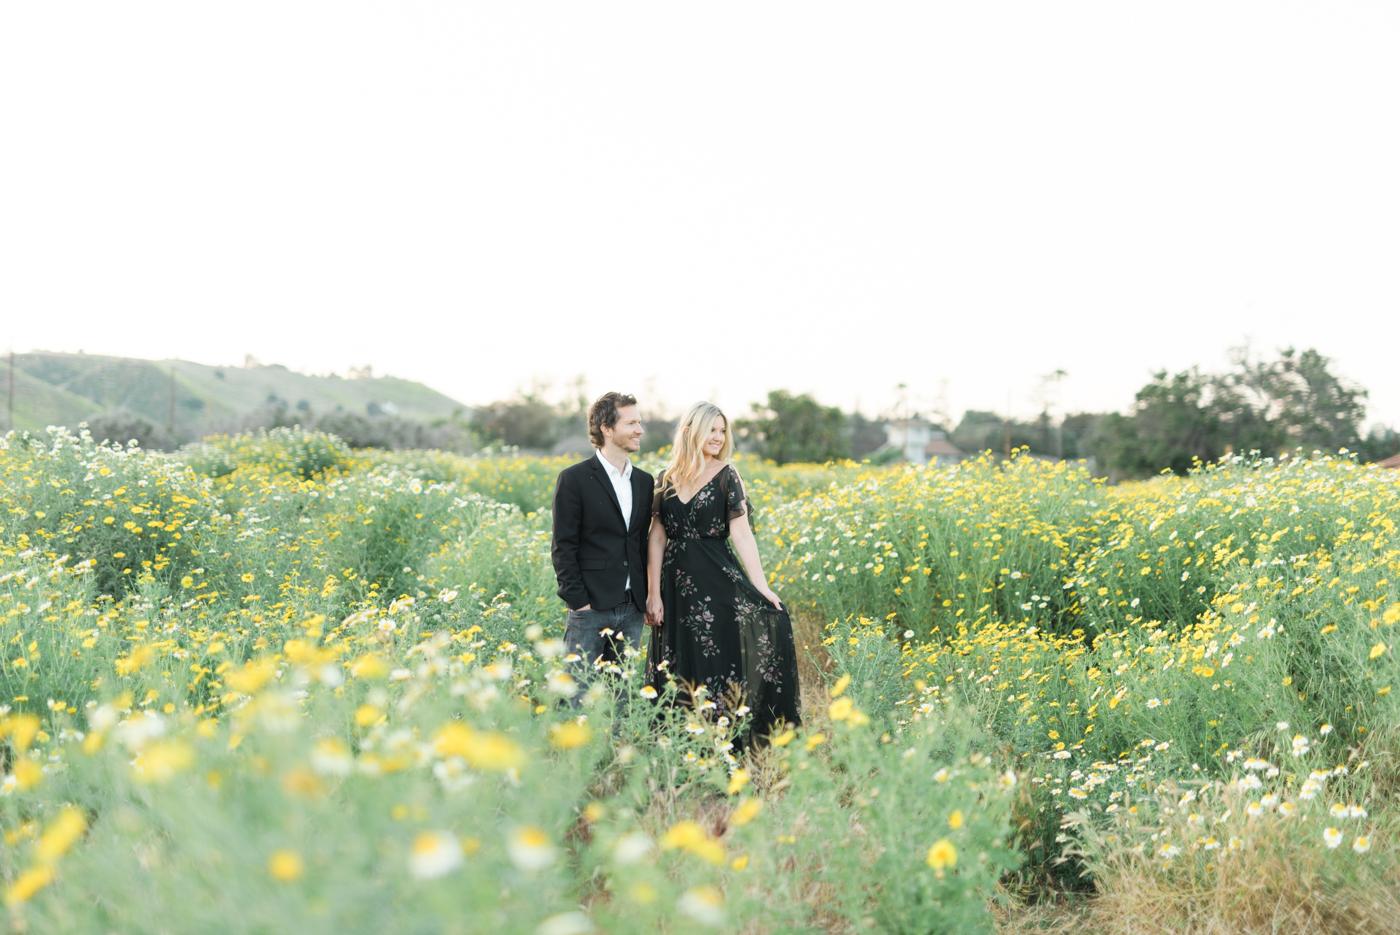 San_Juan_Capistrano_Goldendoodle_family_portrait_session_los_angeles_wedding_photographer-14.jpg